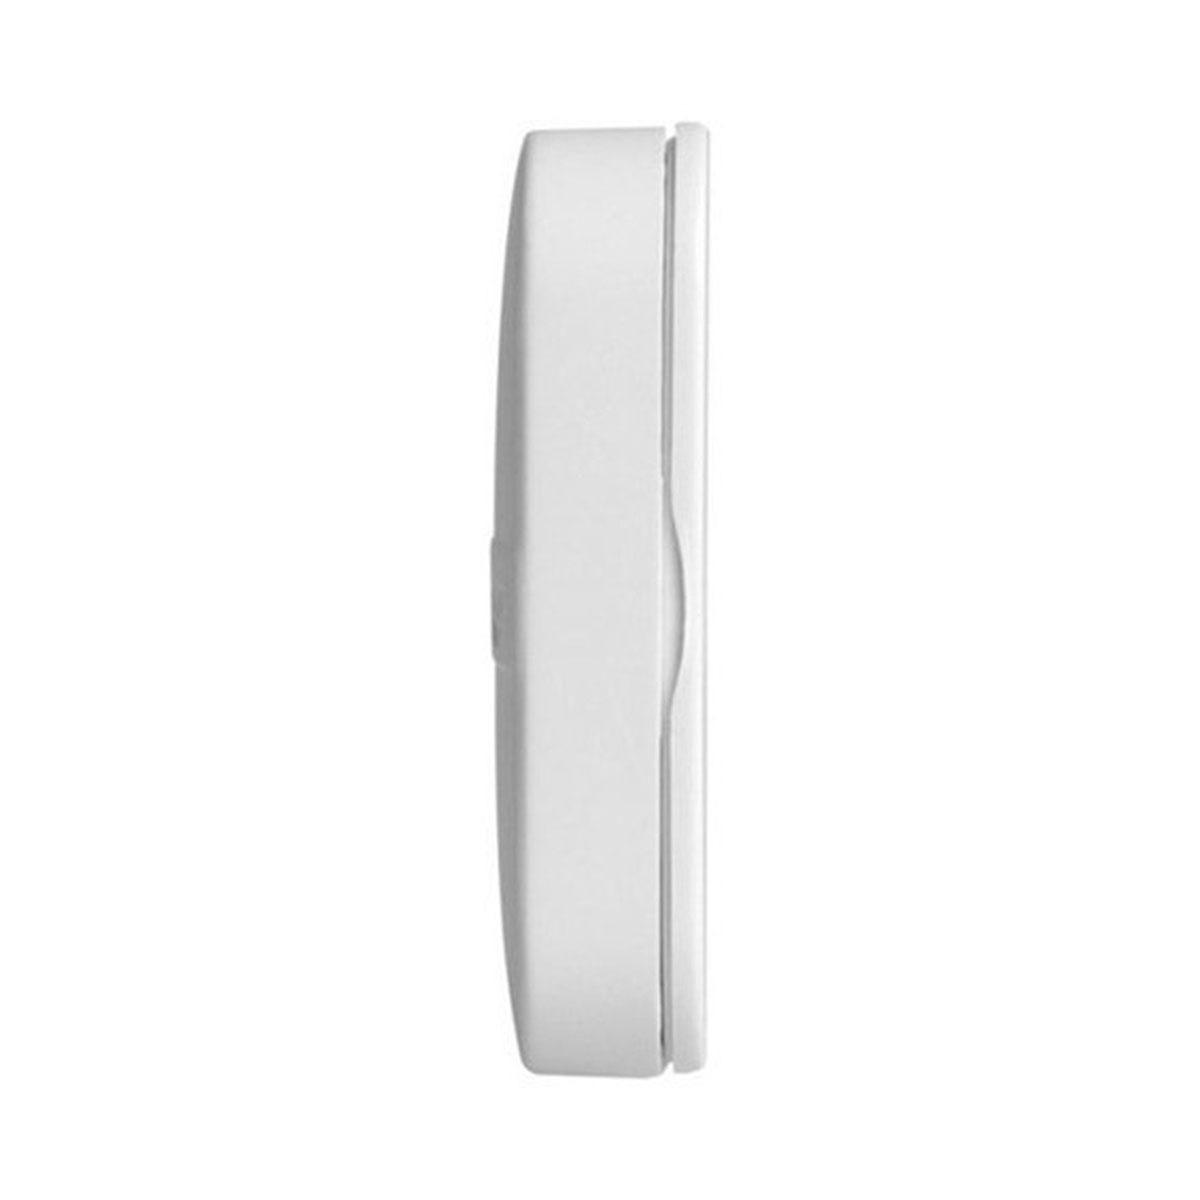 Kit 09 Sensor Magnético Intelbras Sem Fio Xas Smart Branco